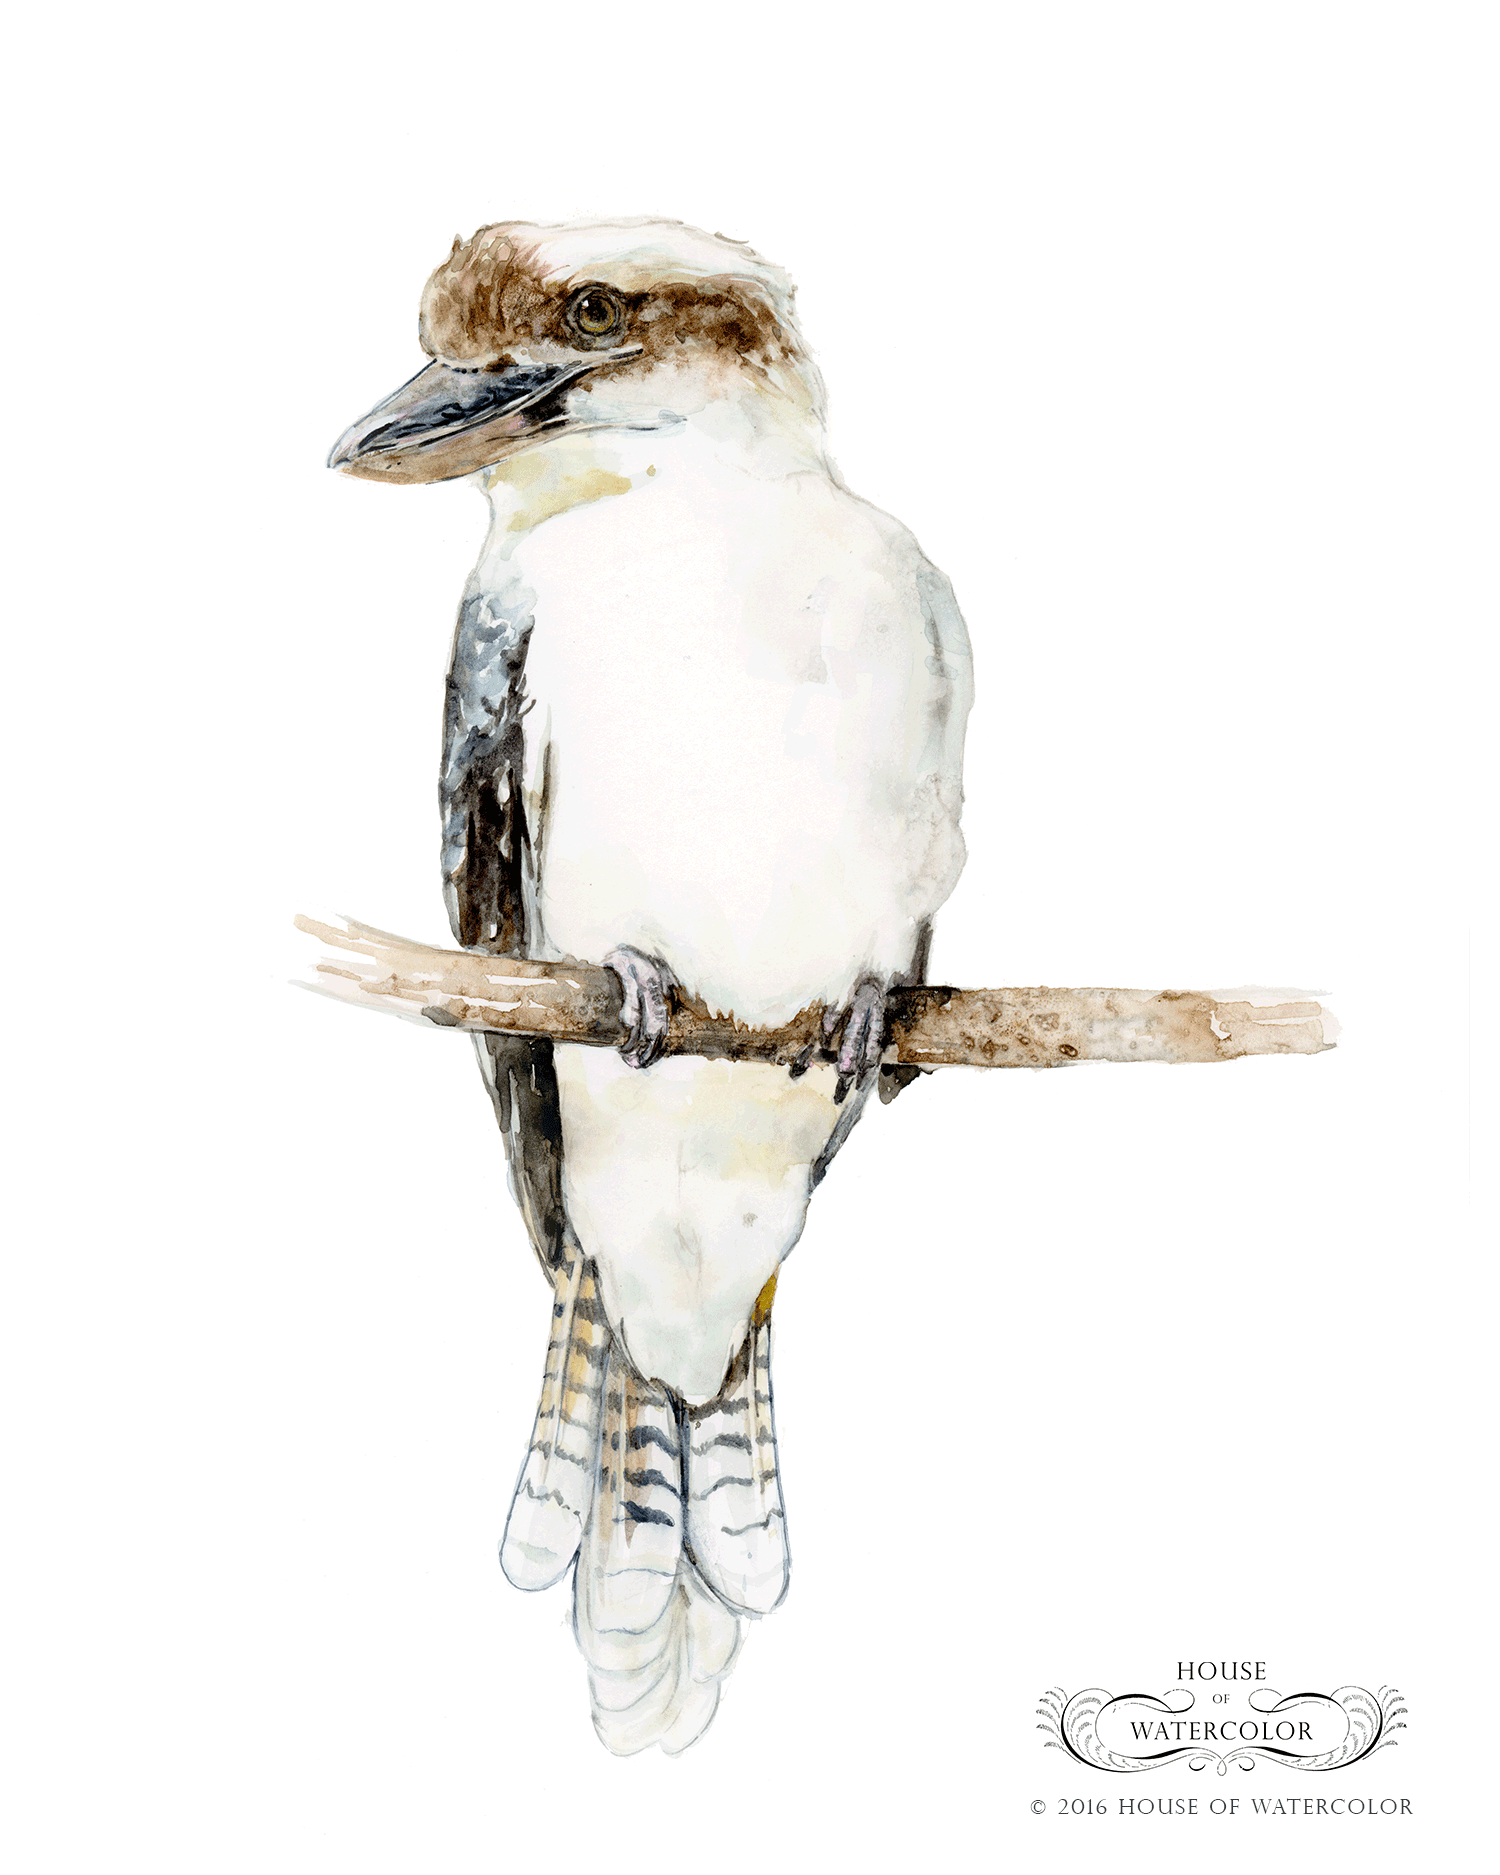 House-of-Watercolor-Kookaburra-Portfolio.png